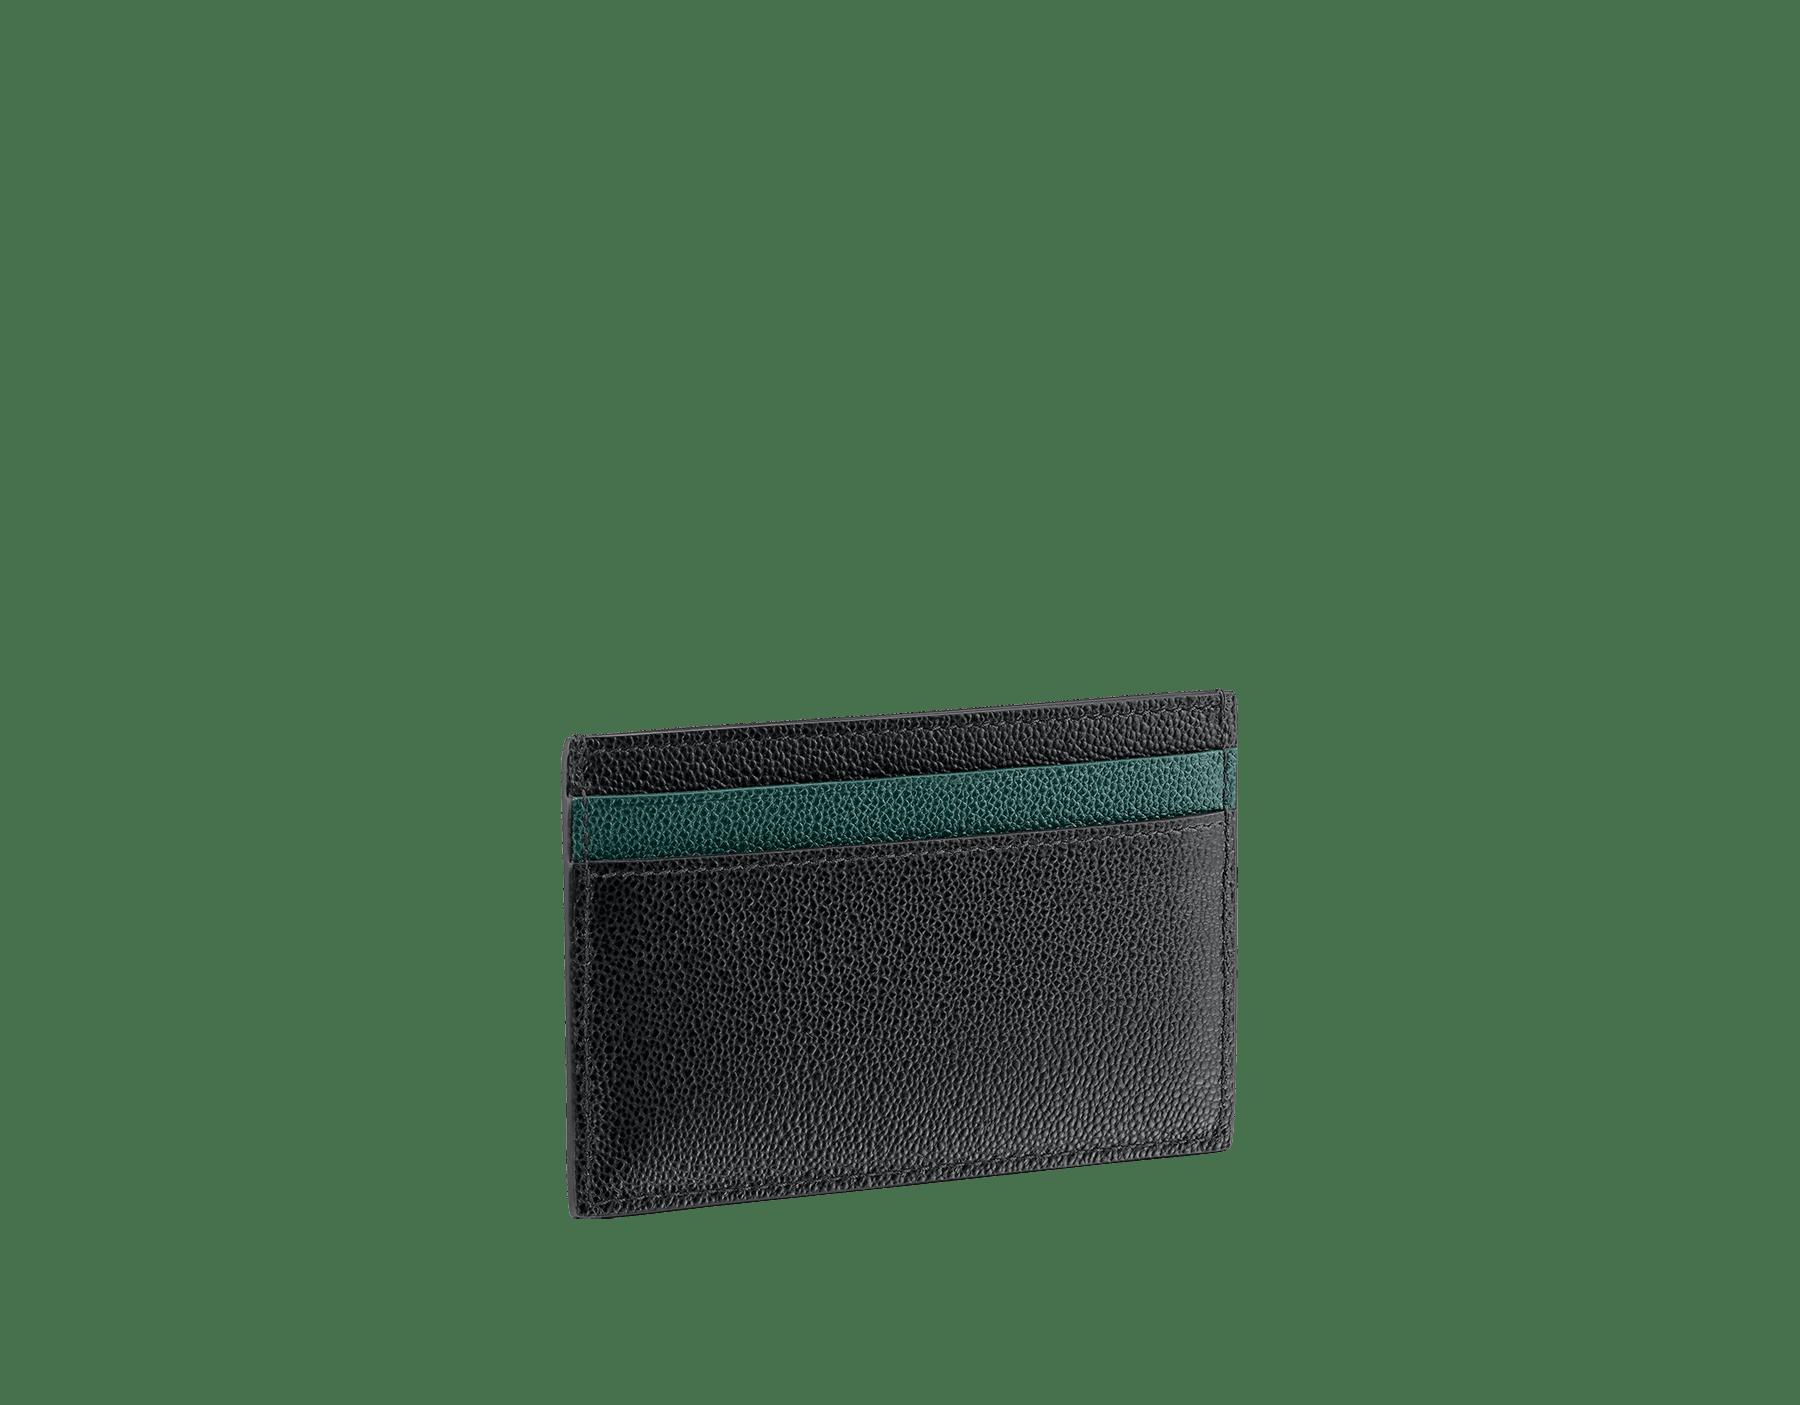 """BVLGARI BVLGARI"" men's card holder in black and Forest Emerald green ""Urban"" grain calf leather. Iconic logo embellishment in dark ruthenium-plated brass with black enameling. BBM-CCHOLDERASYM image 2"